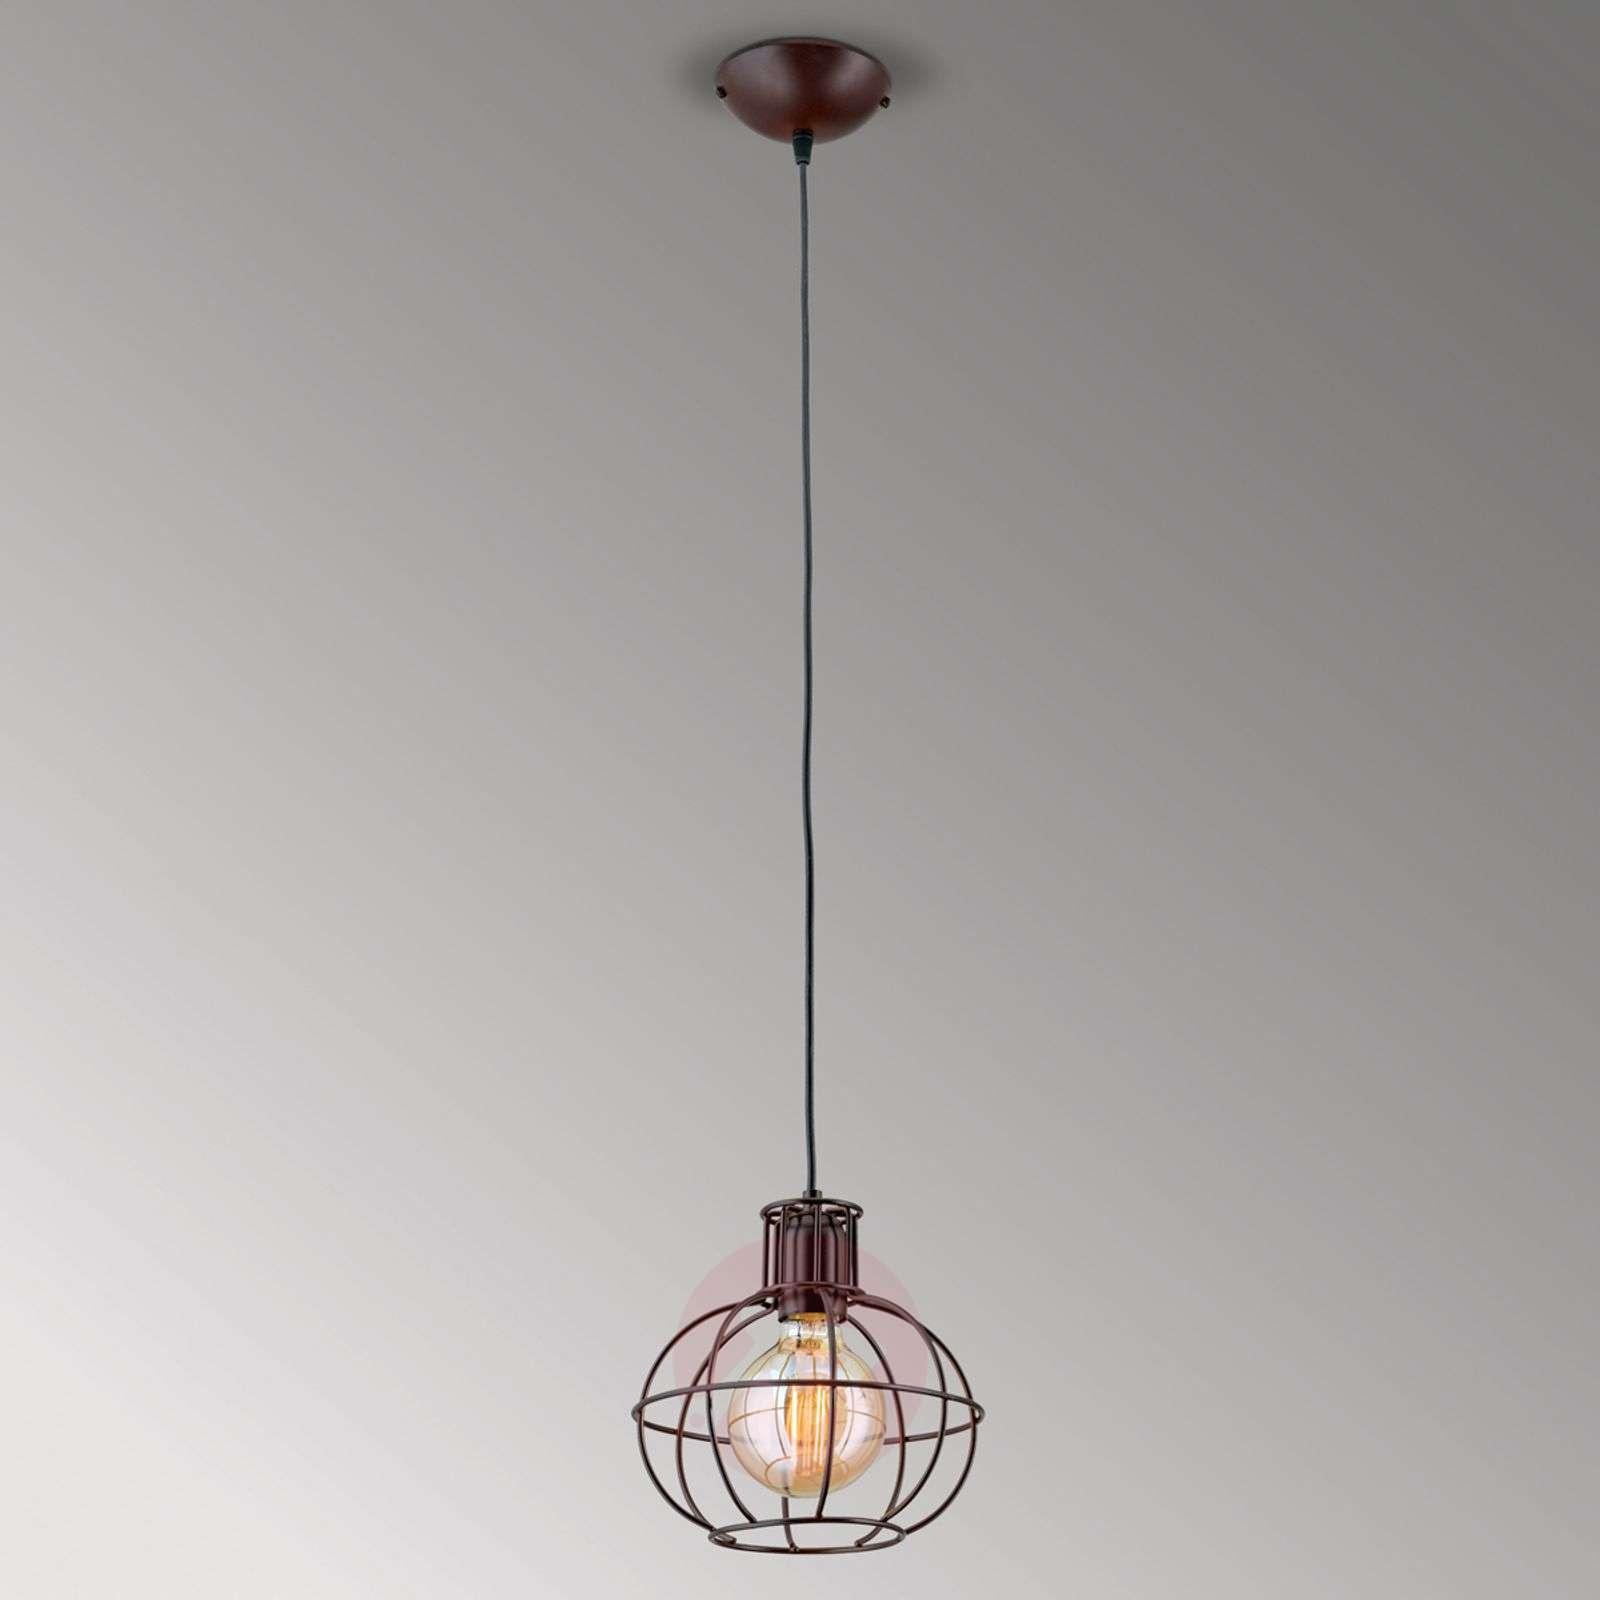 Antique brown hanging light Dilip-7255166-01